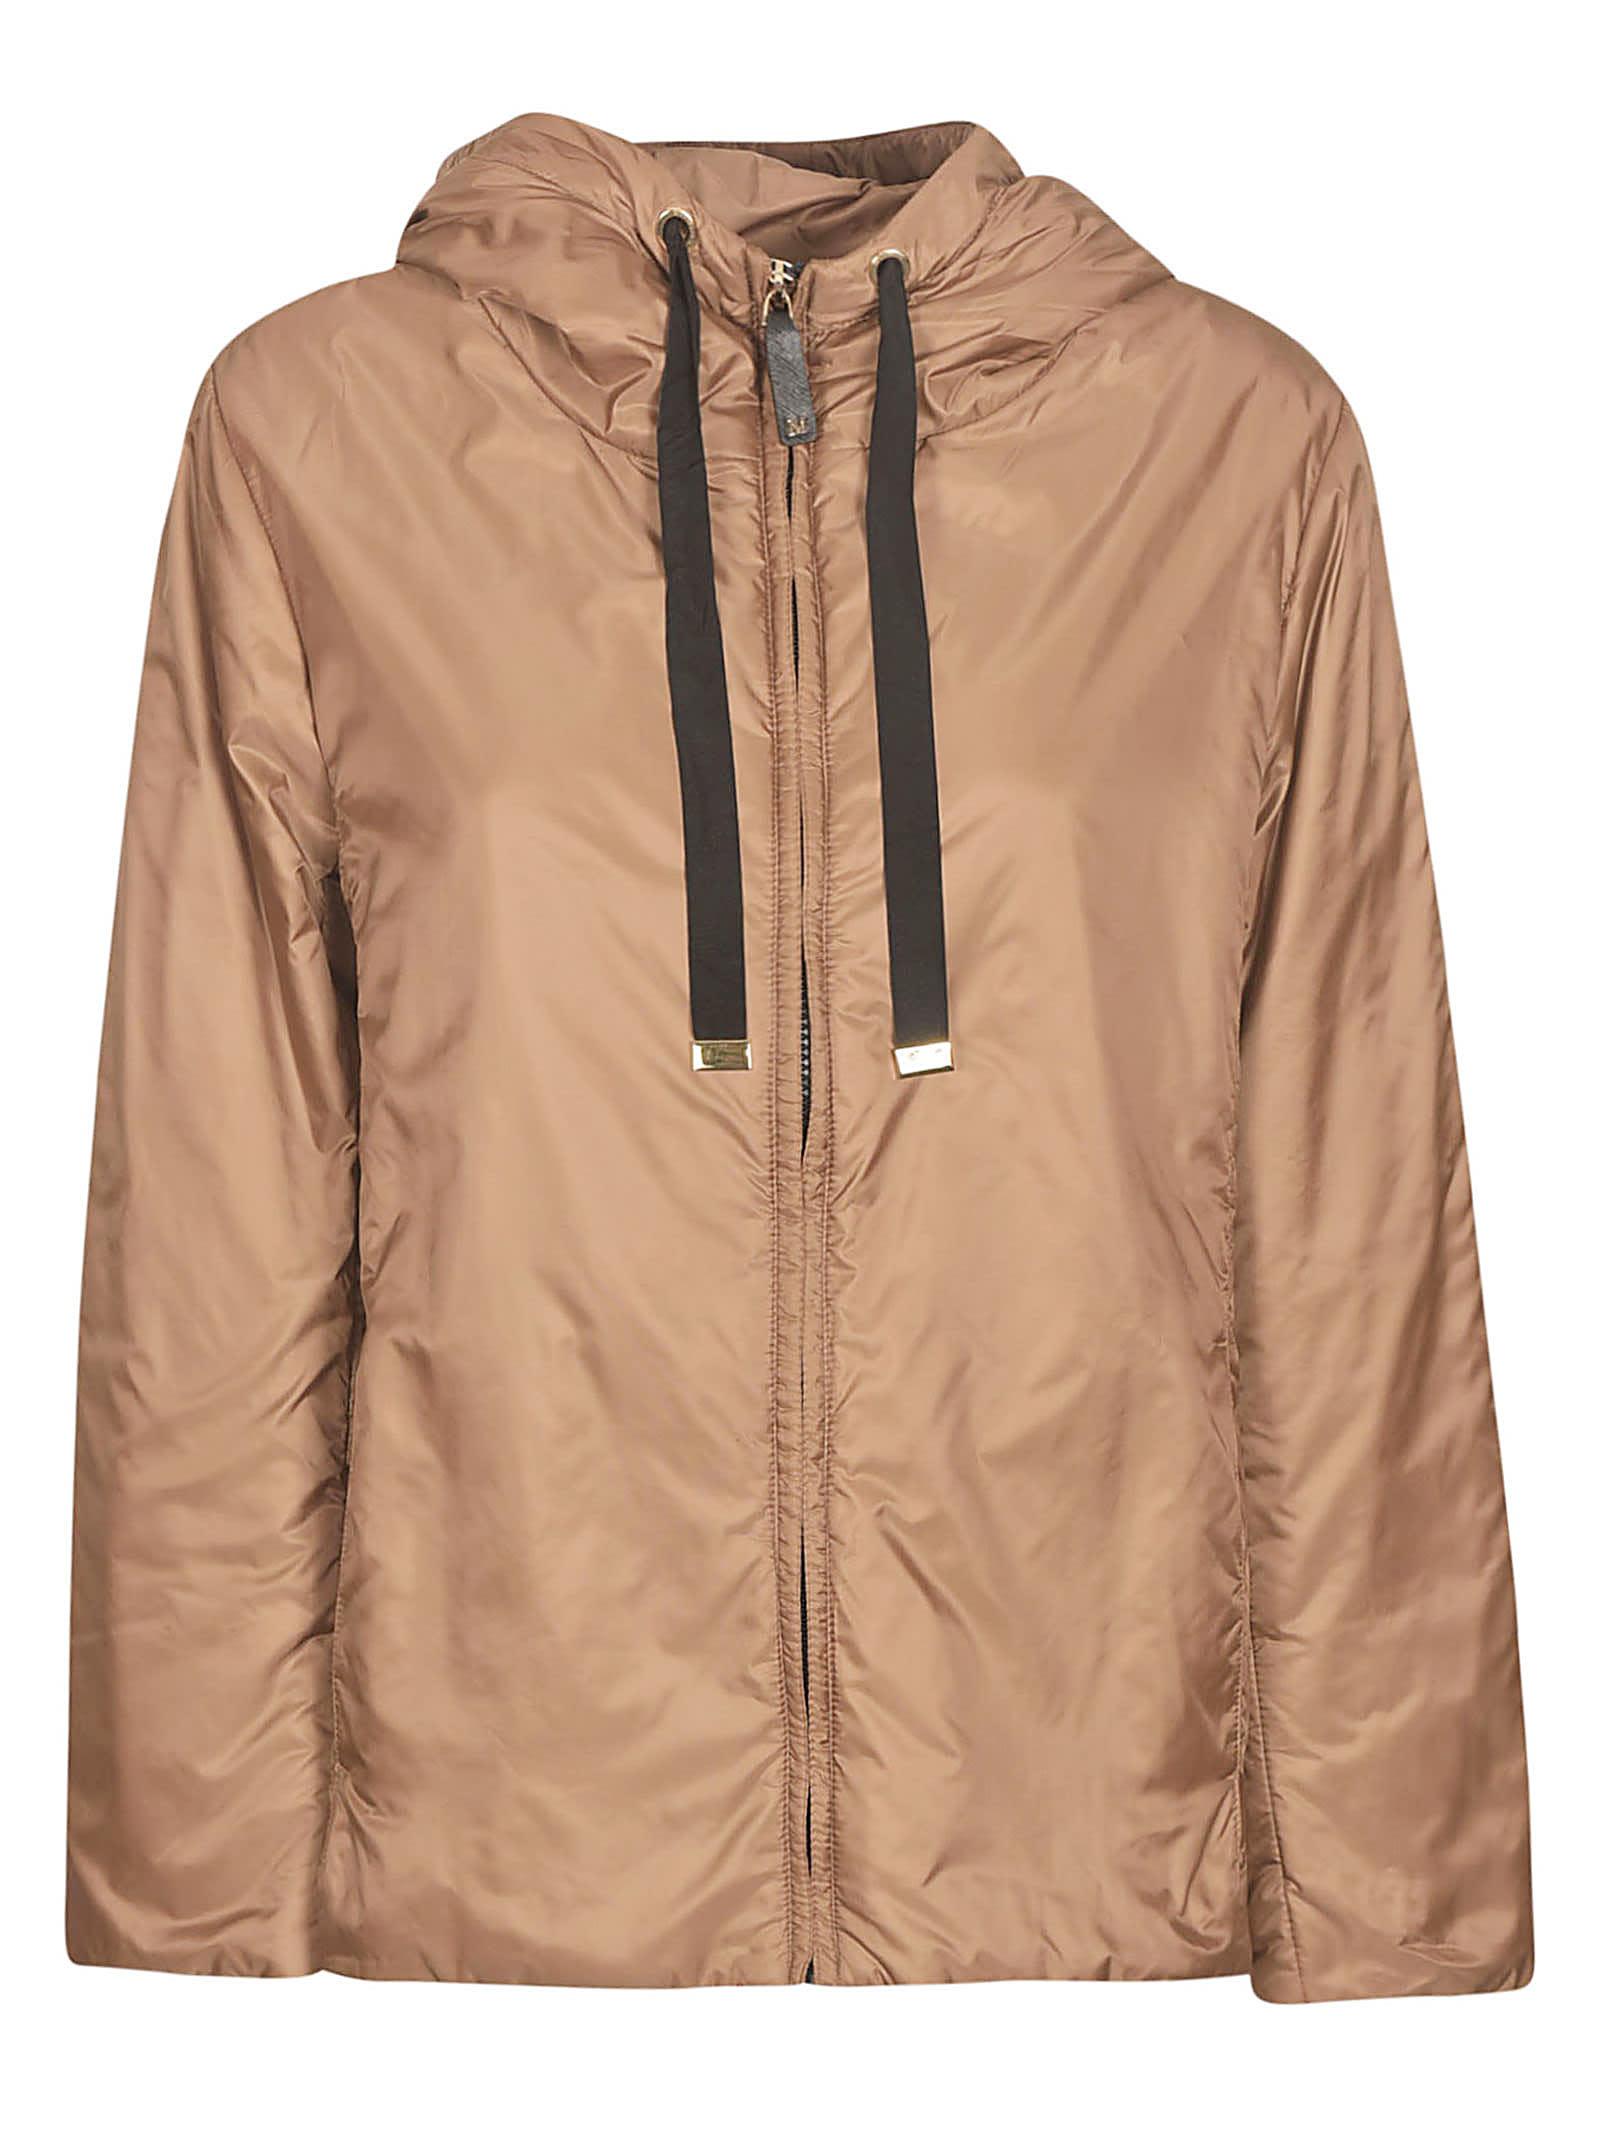 Greenh Hooded Jacket